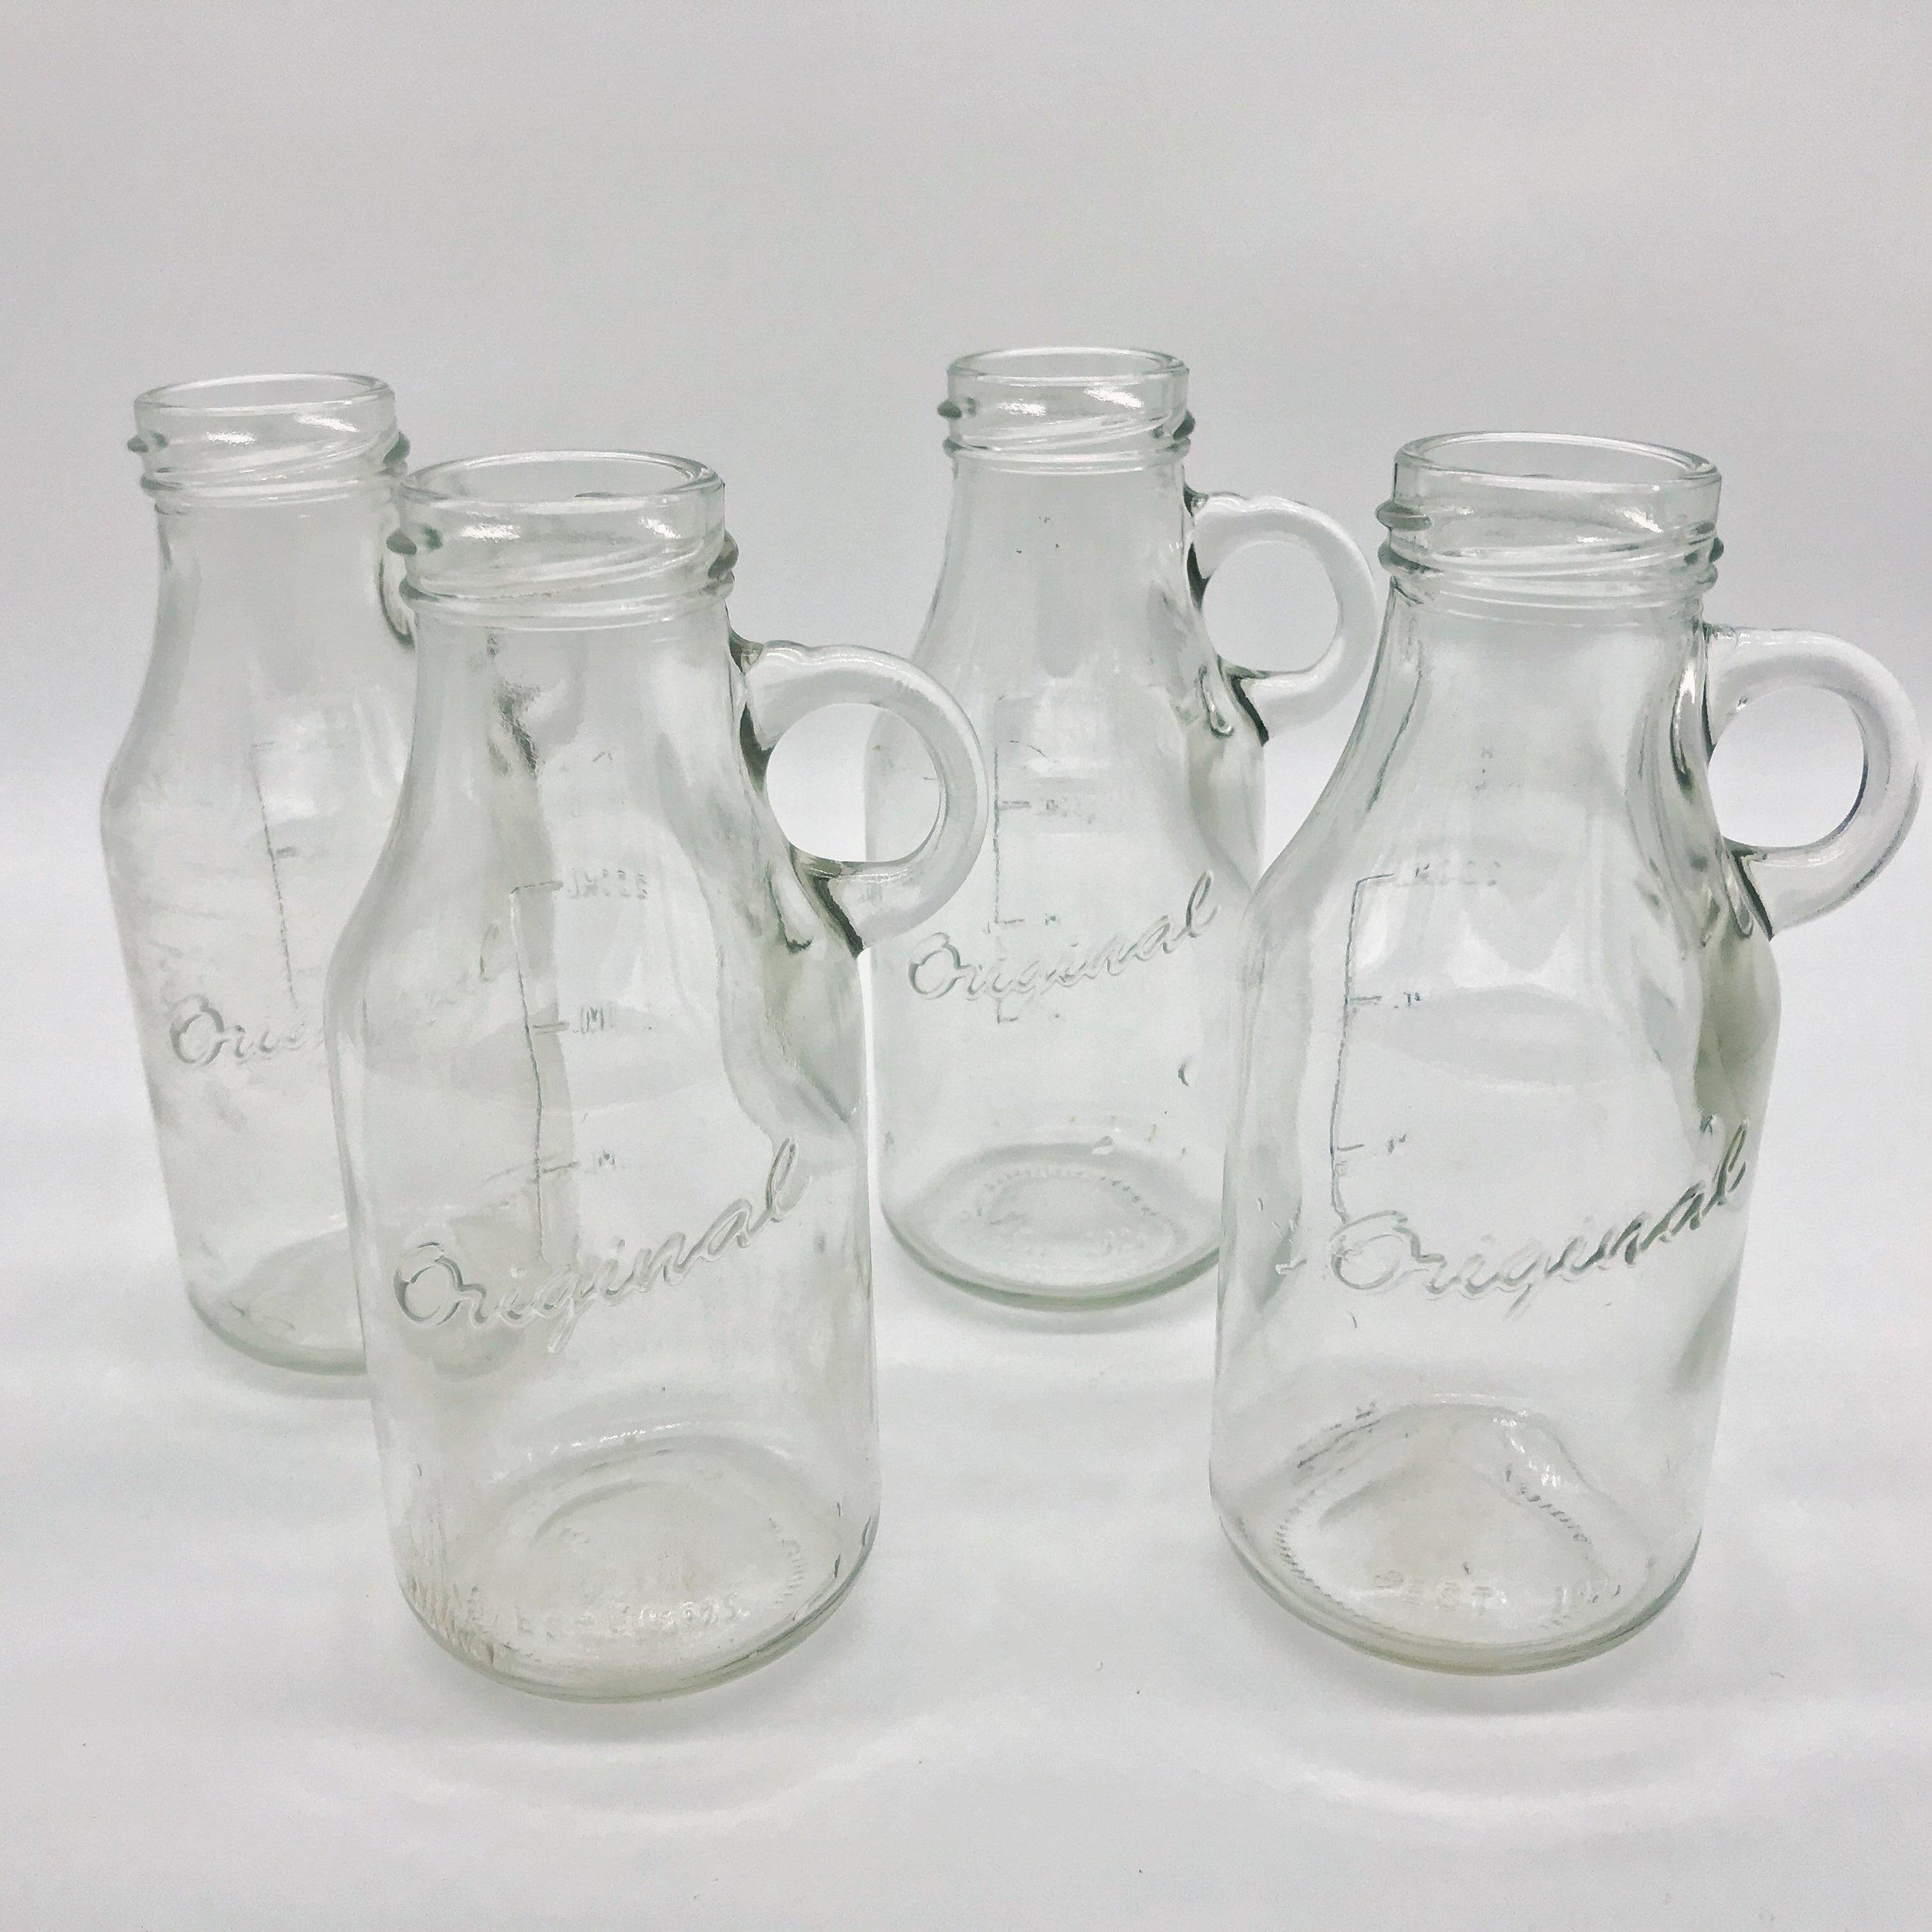 Vintage milk bottles  Price:$0.50  Qty: 9